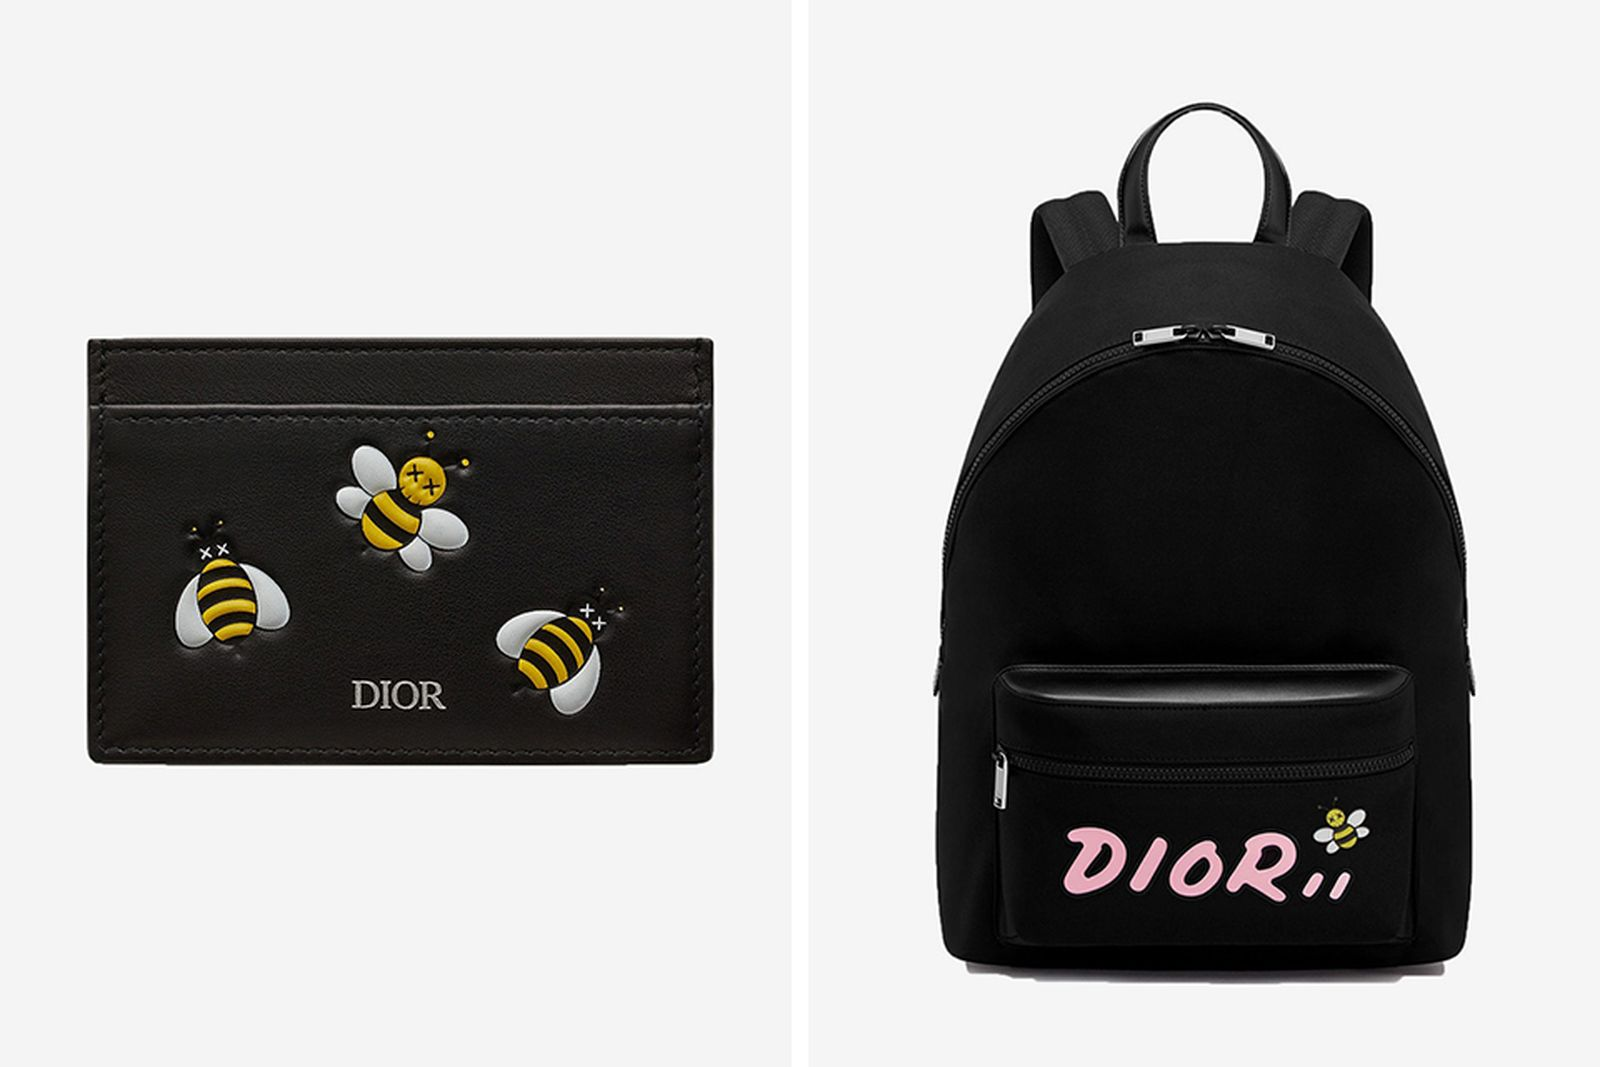 dior main Christian Dior KAWS StockX